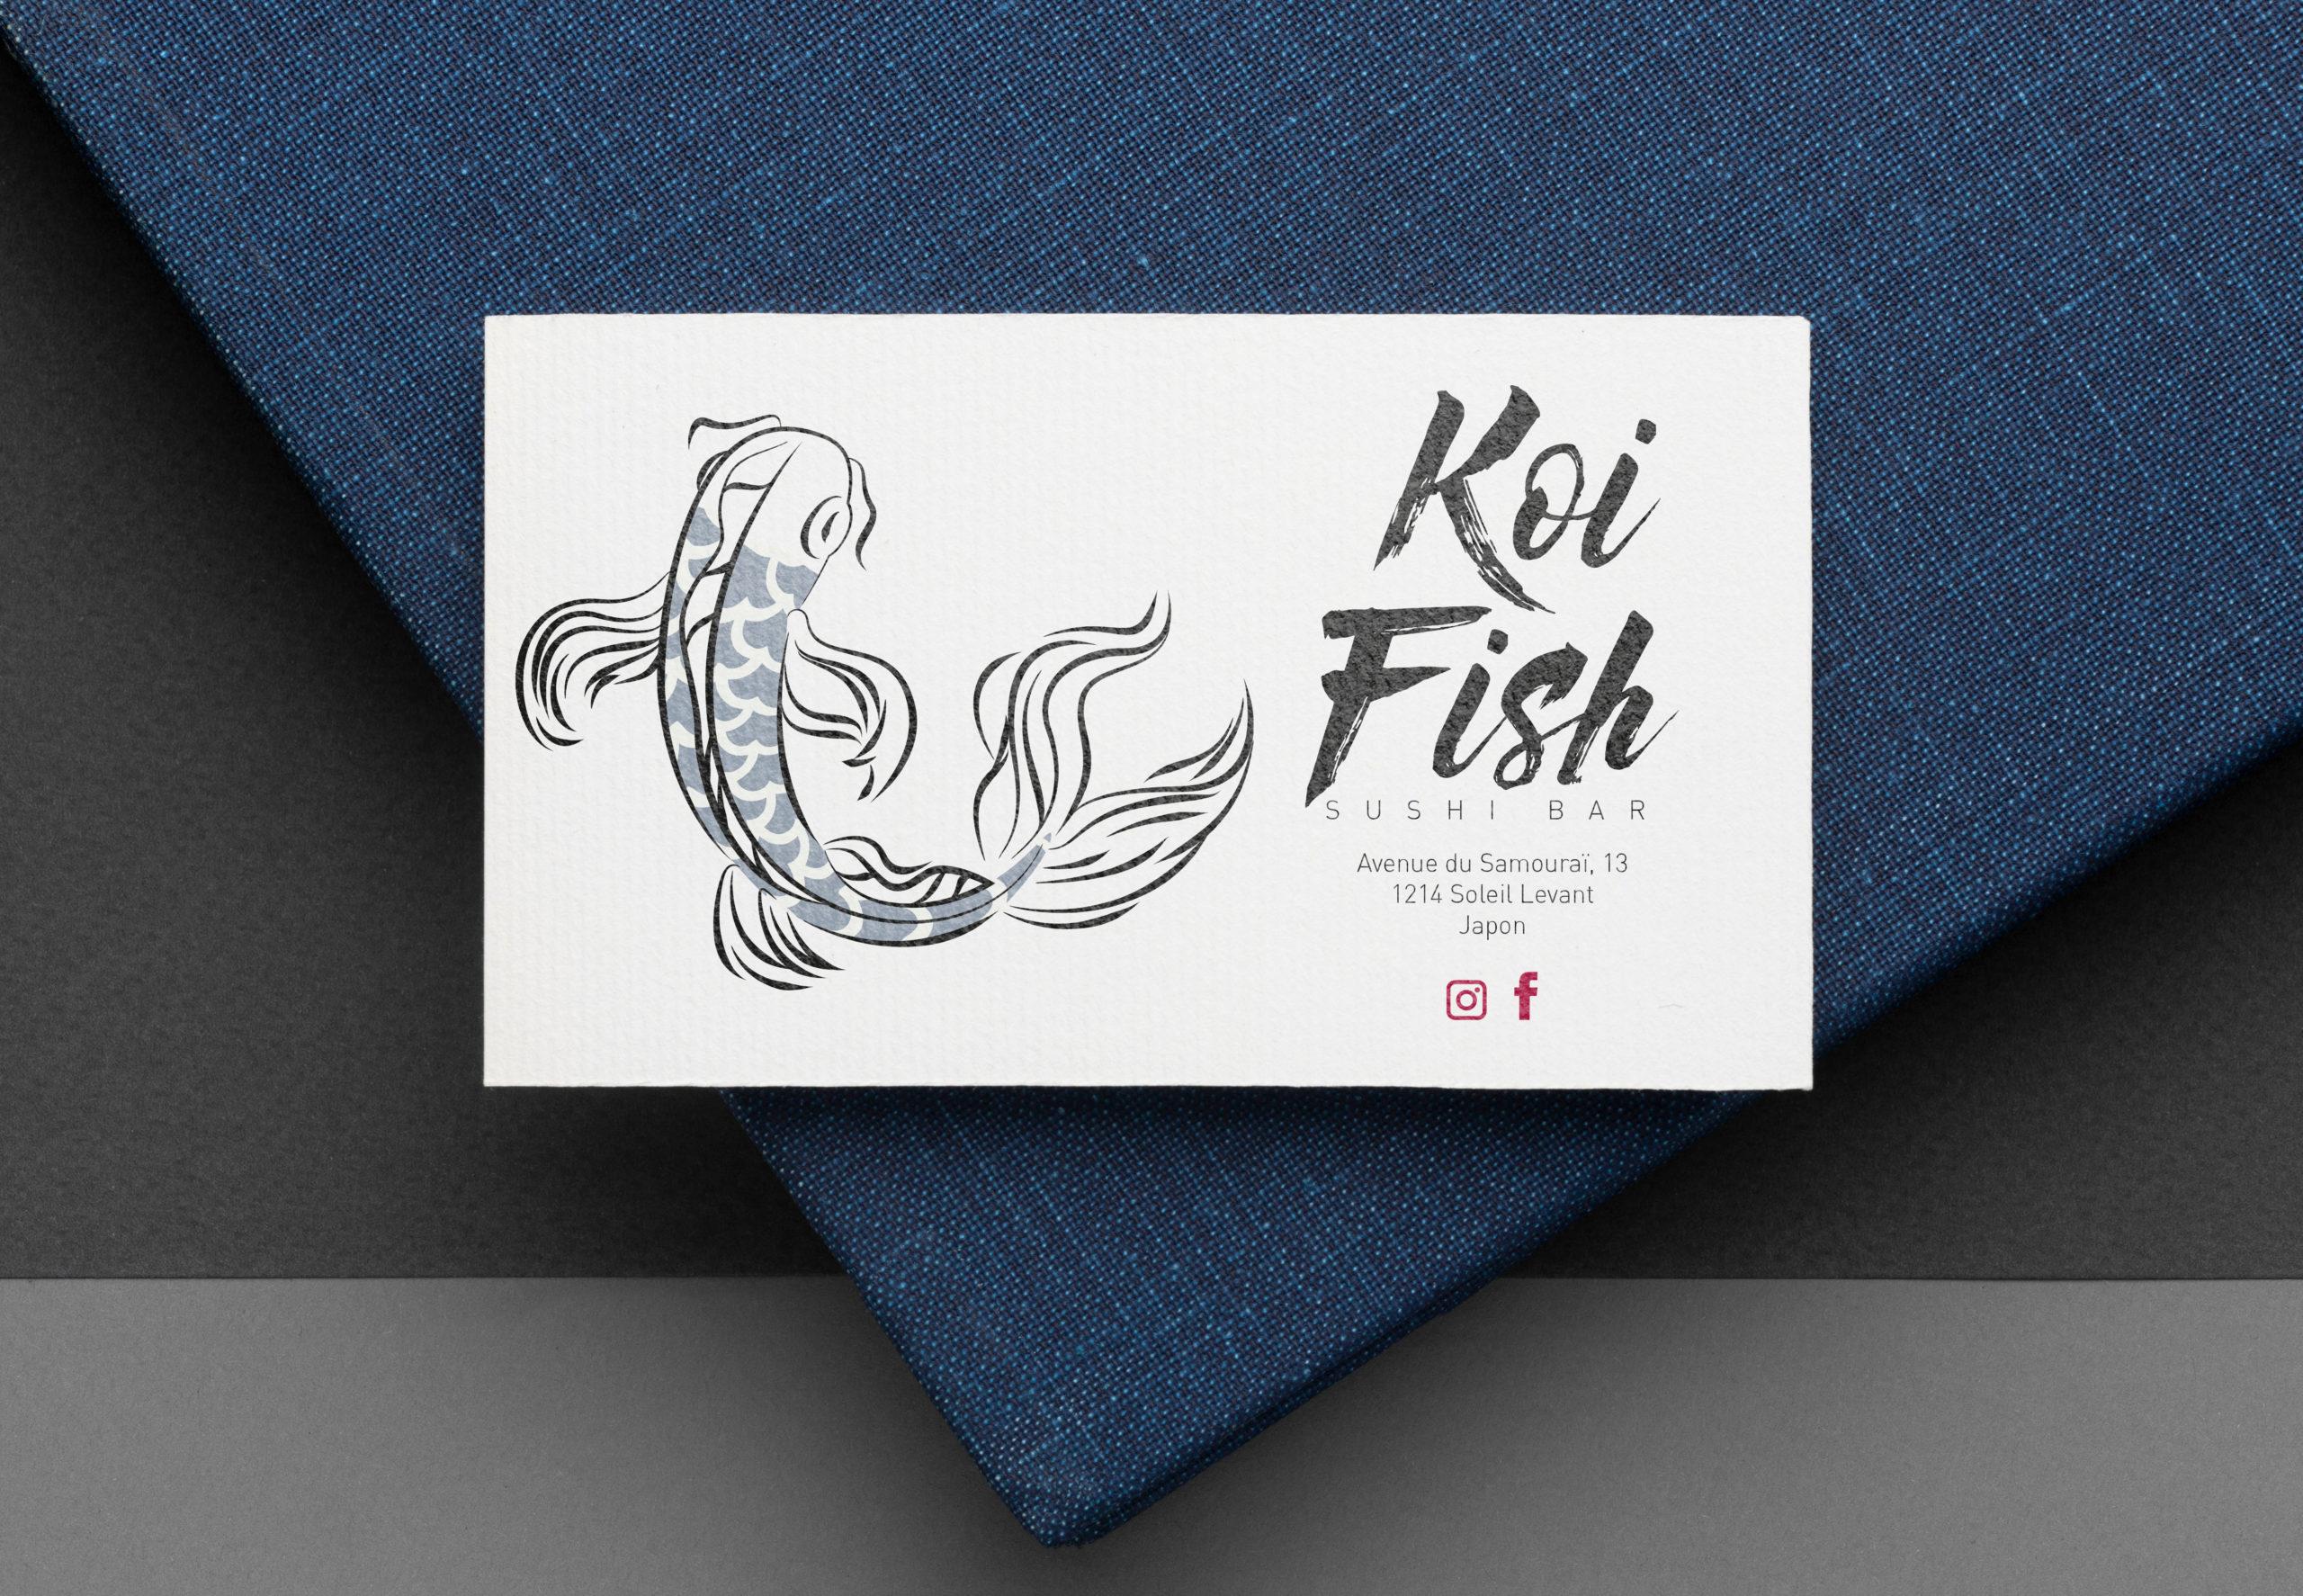 Koi Fish Sushi bar